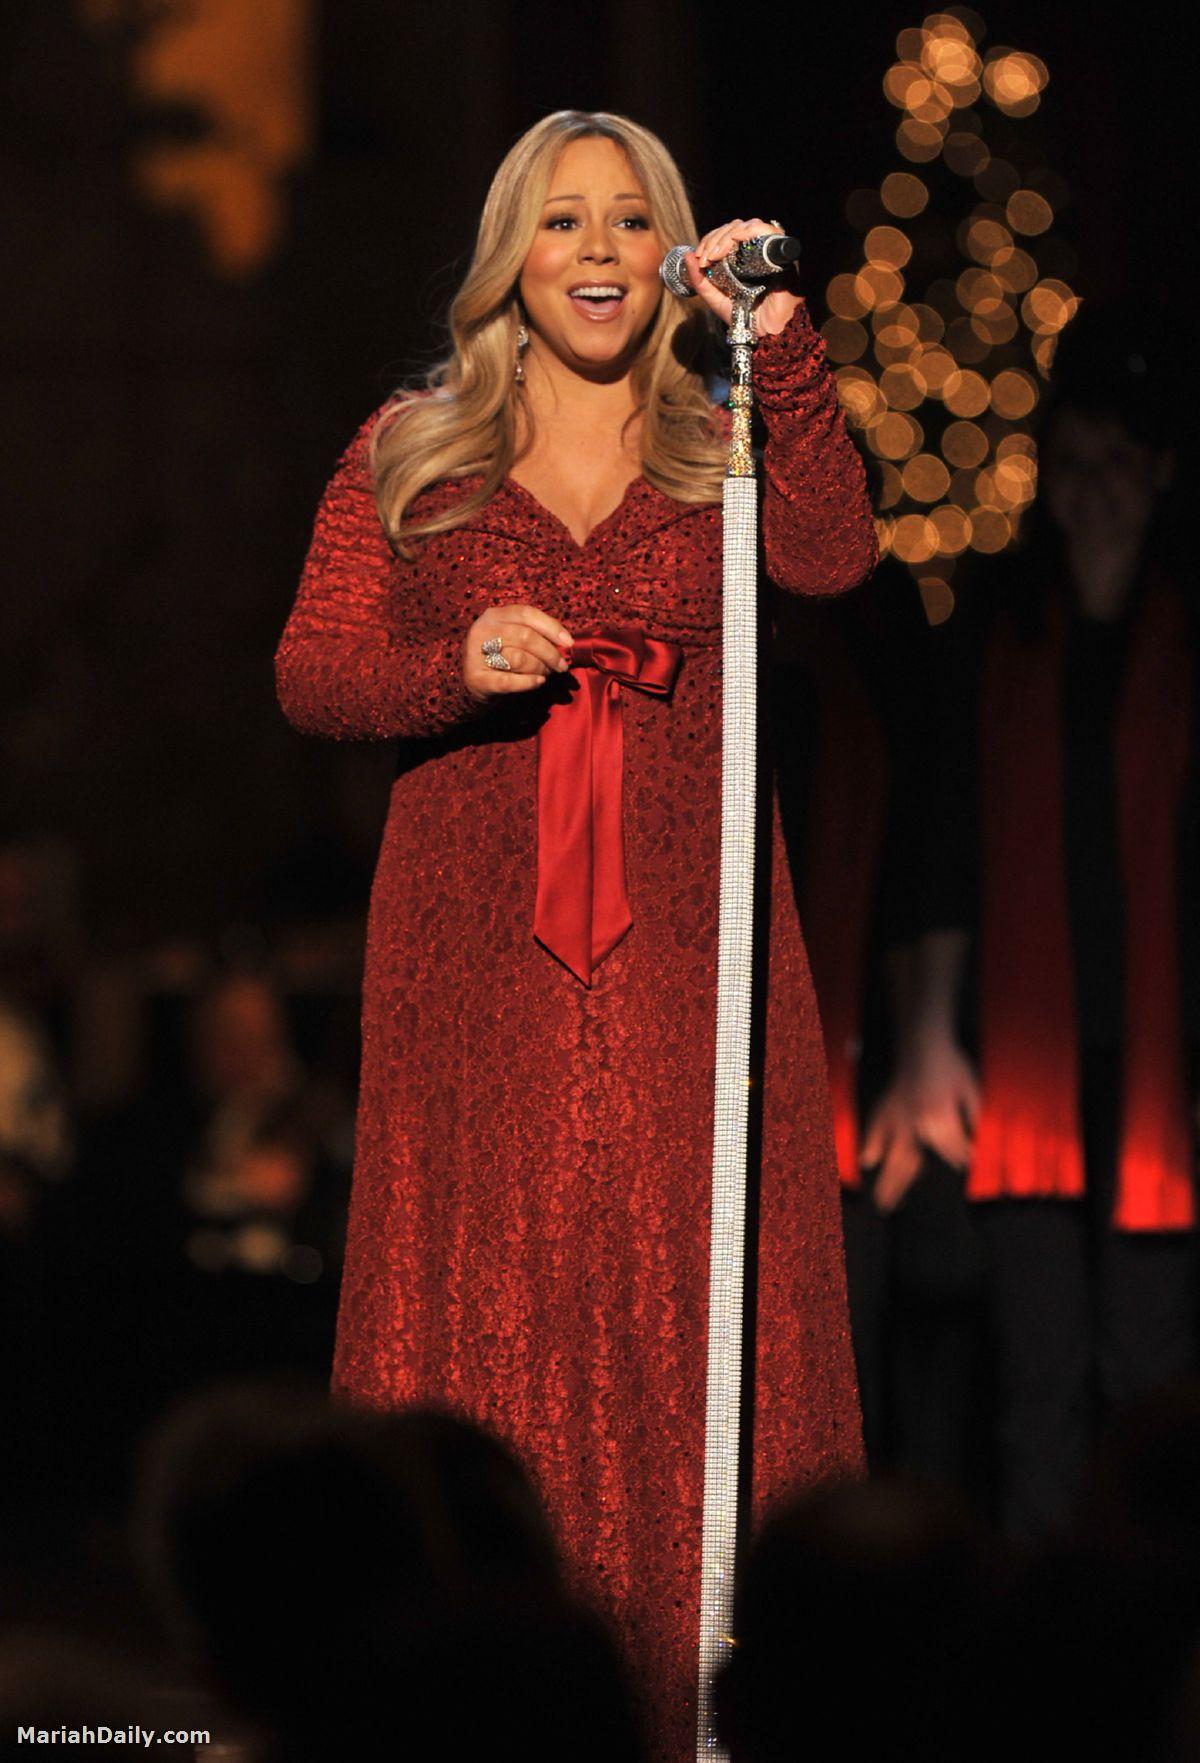 mariah51 Hot Shots: Mariah, Maxwell & Others Perform In Washington